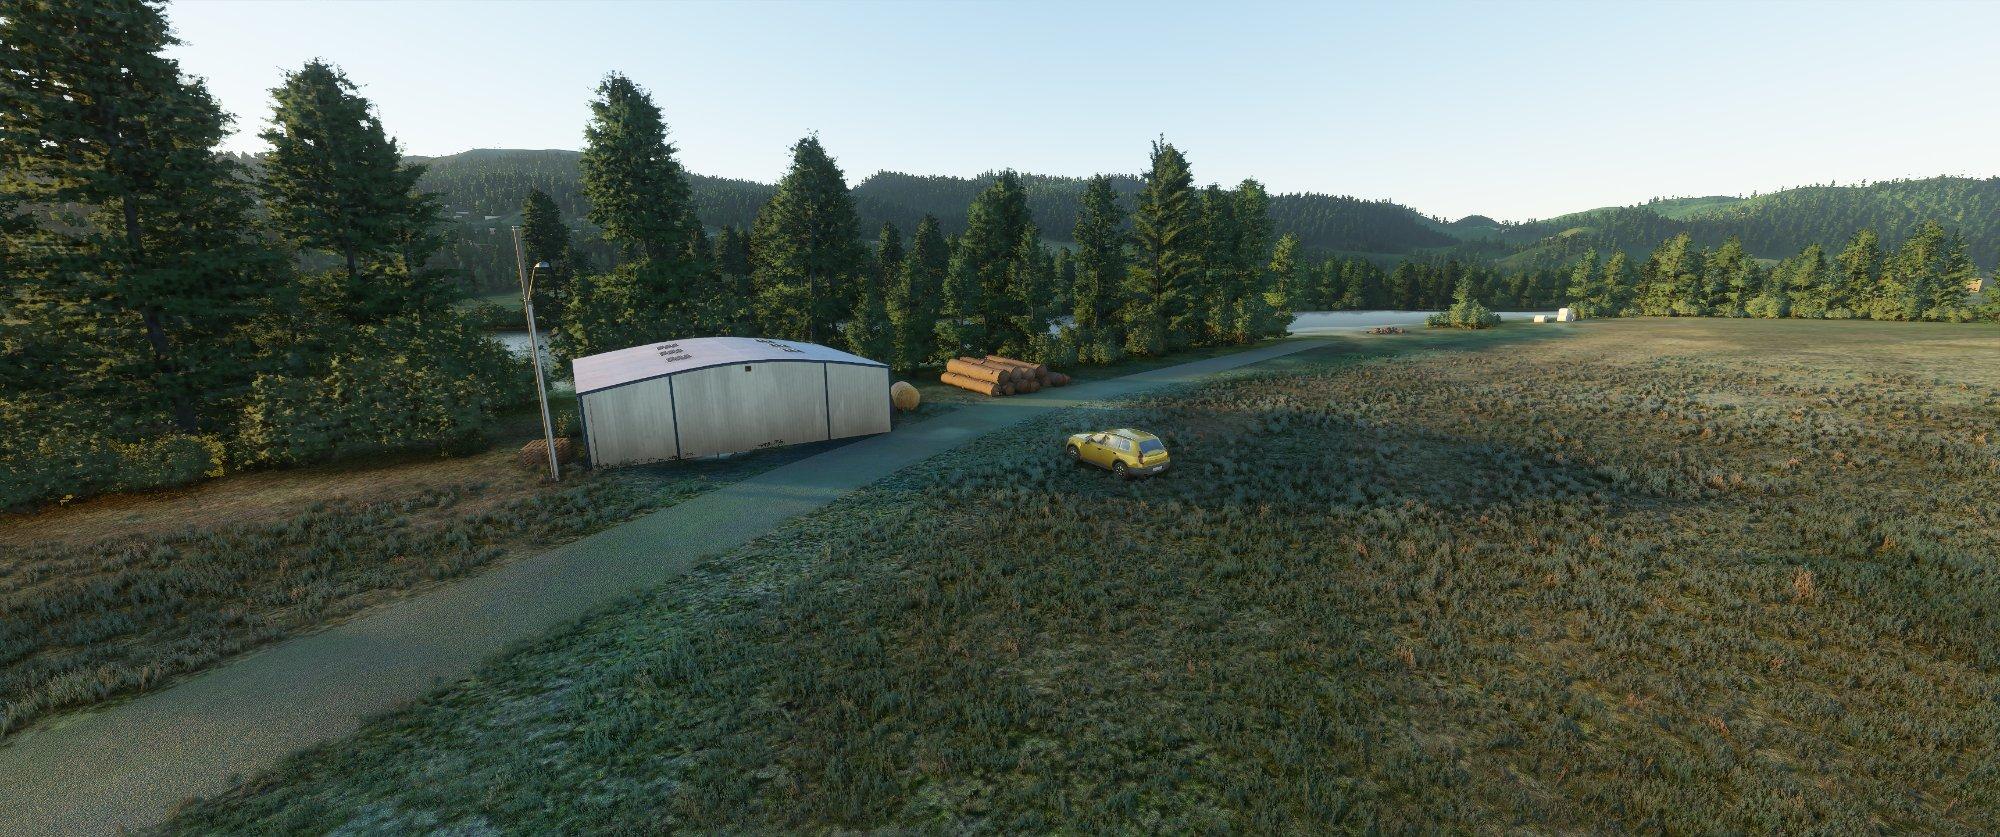 Microsoft Flight Simulator Screenshot 2020.10.07 - 19.45.18.75.jpg